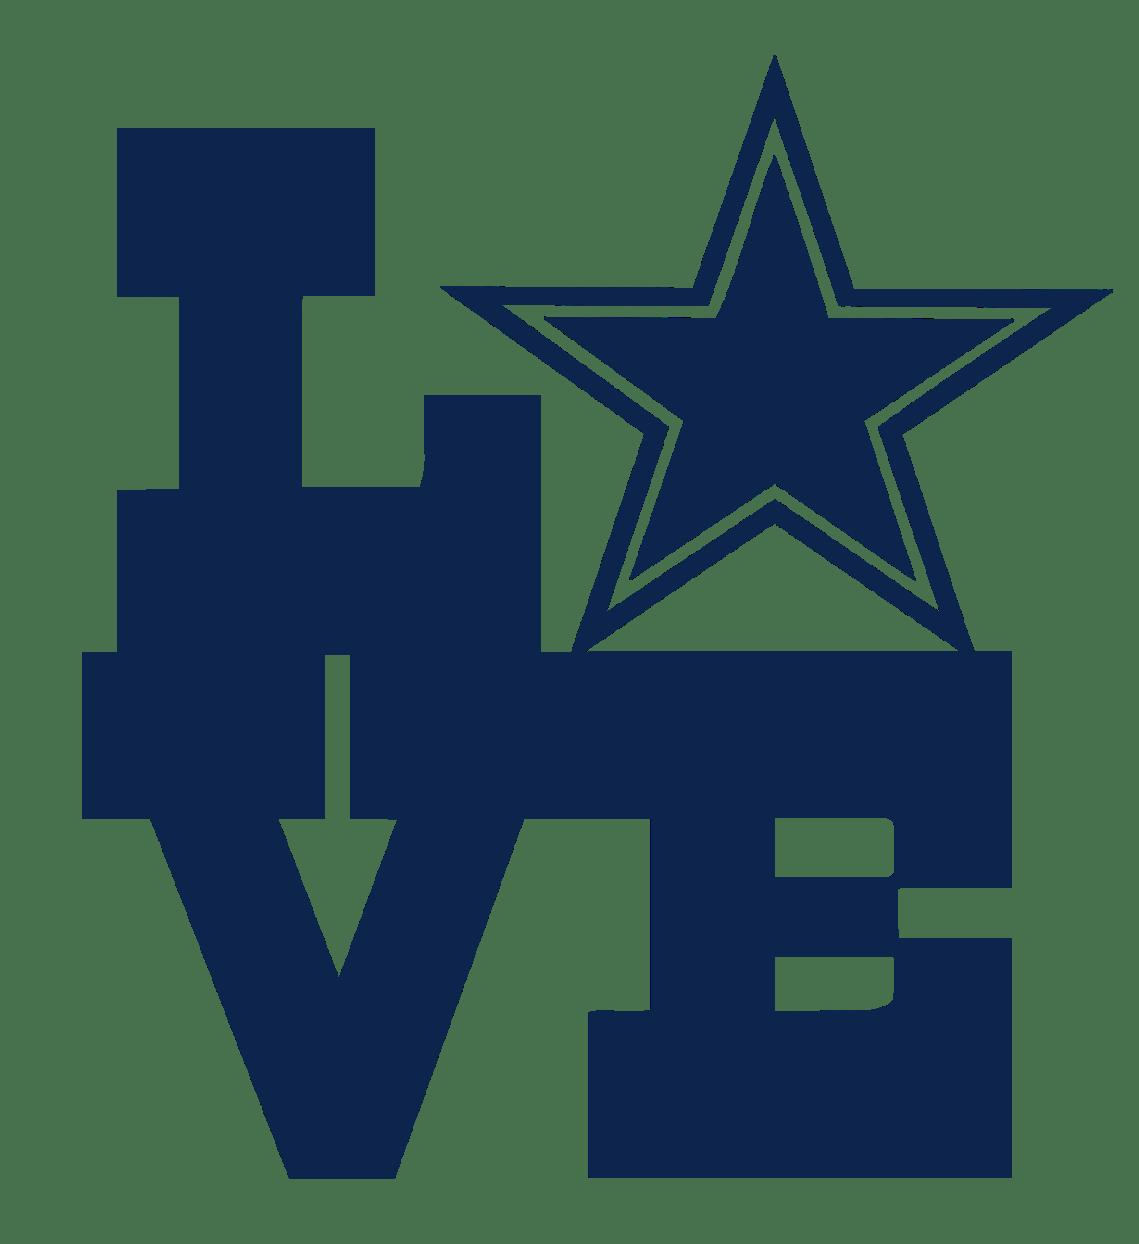 Download Dallas cowboys clipart text, Dallas cowboys text ...